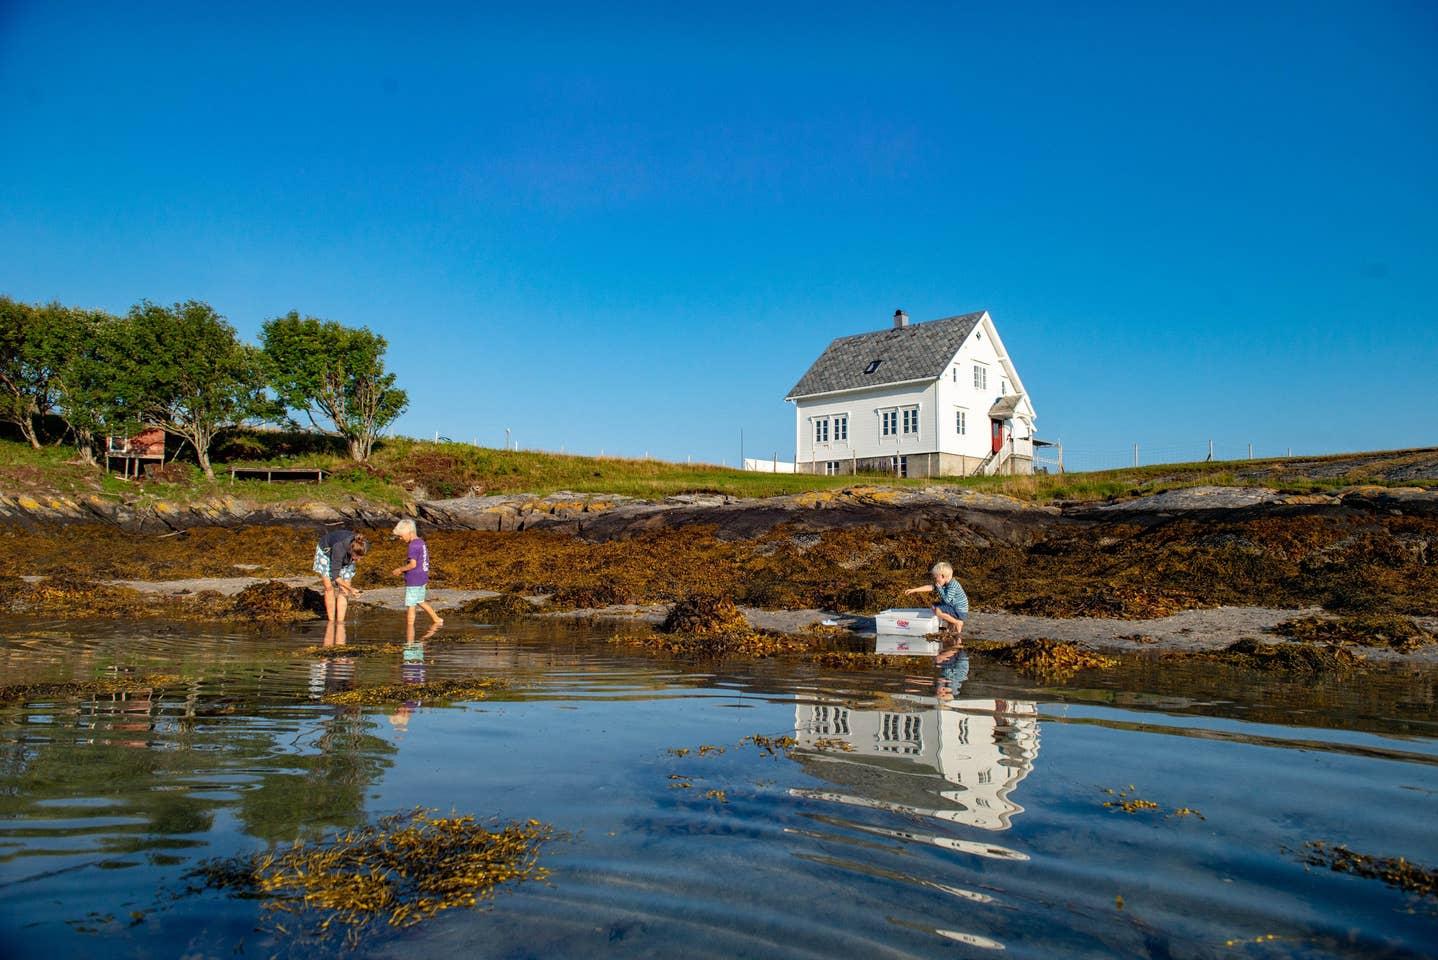 Notholmen Island, Norway